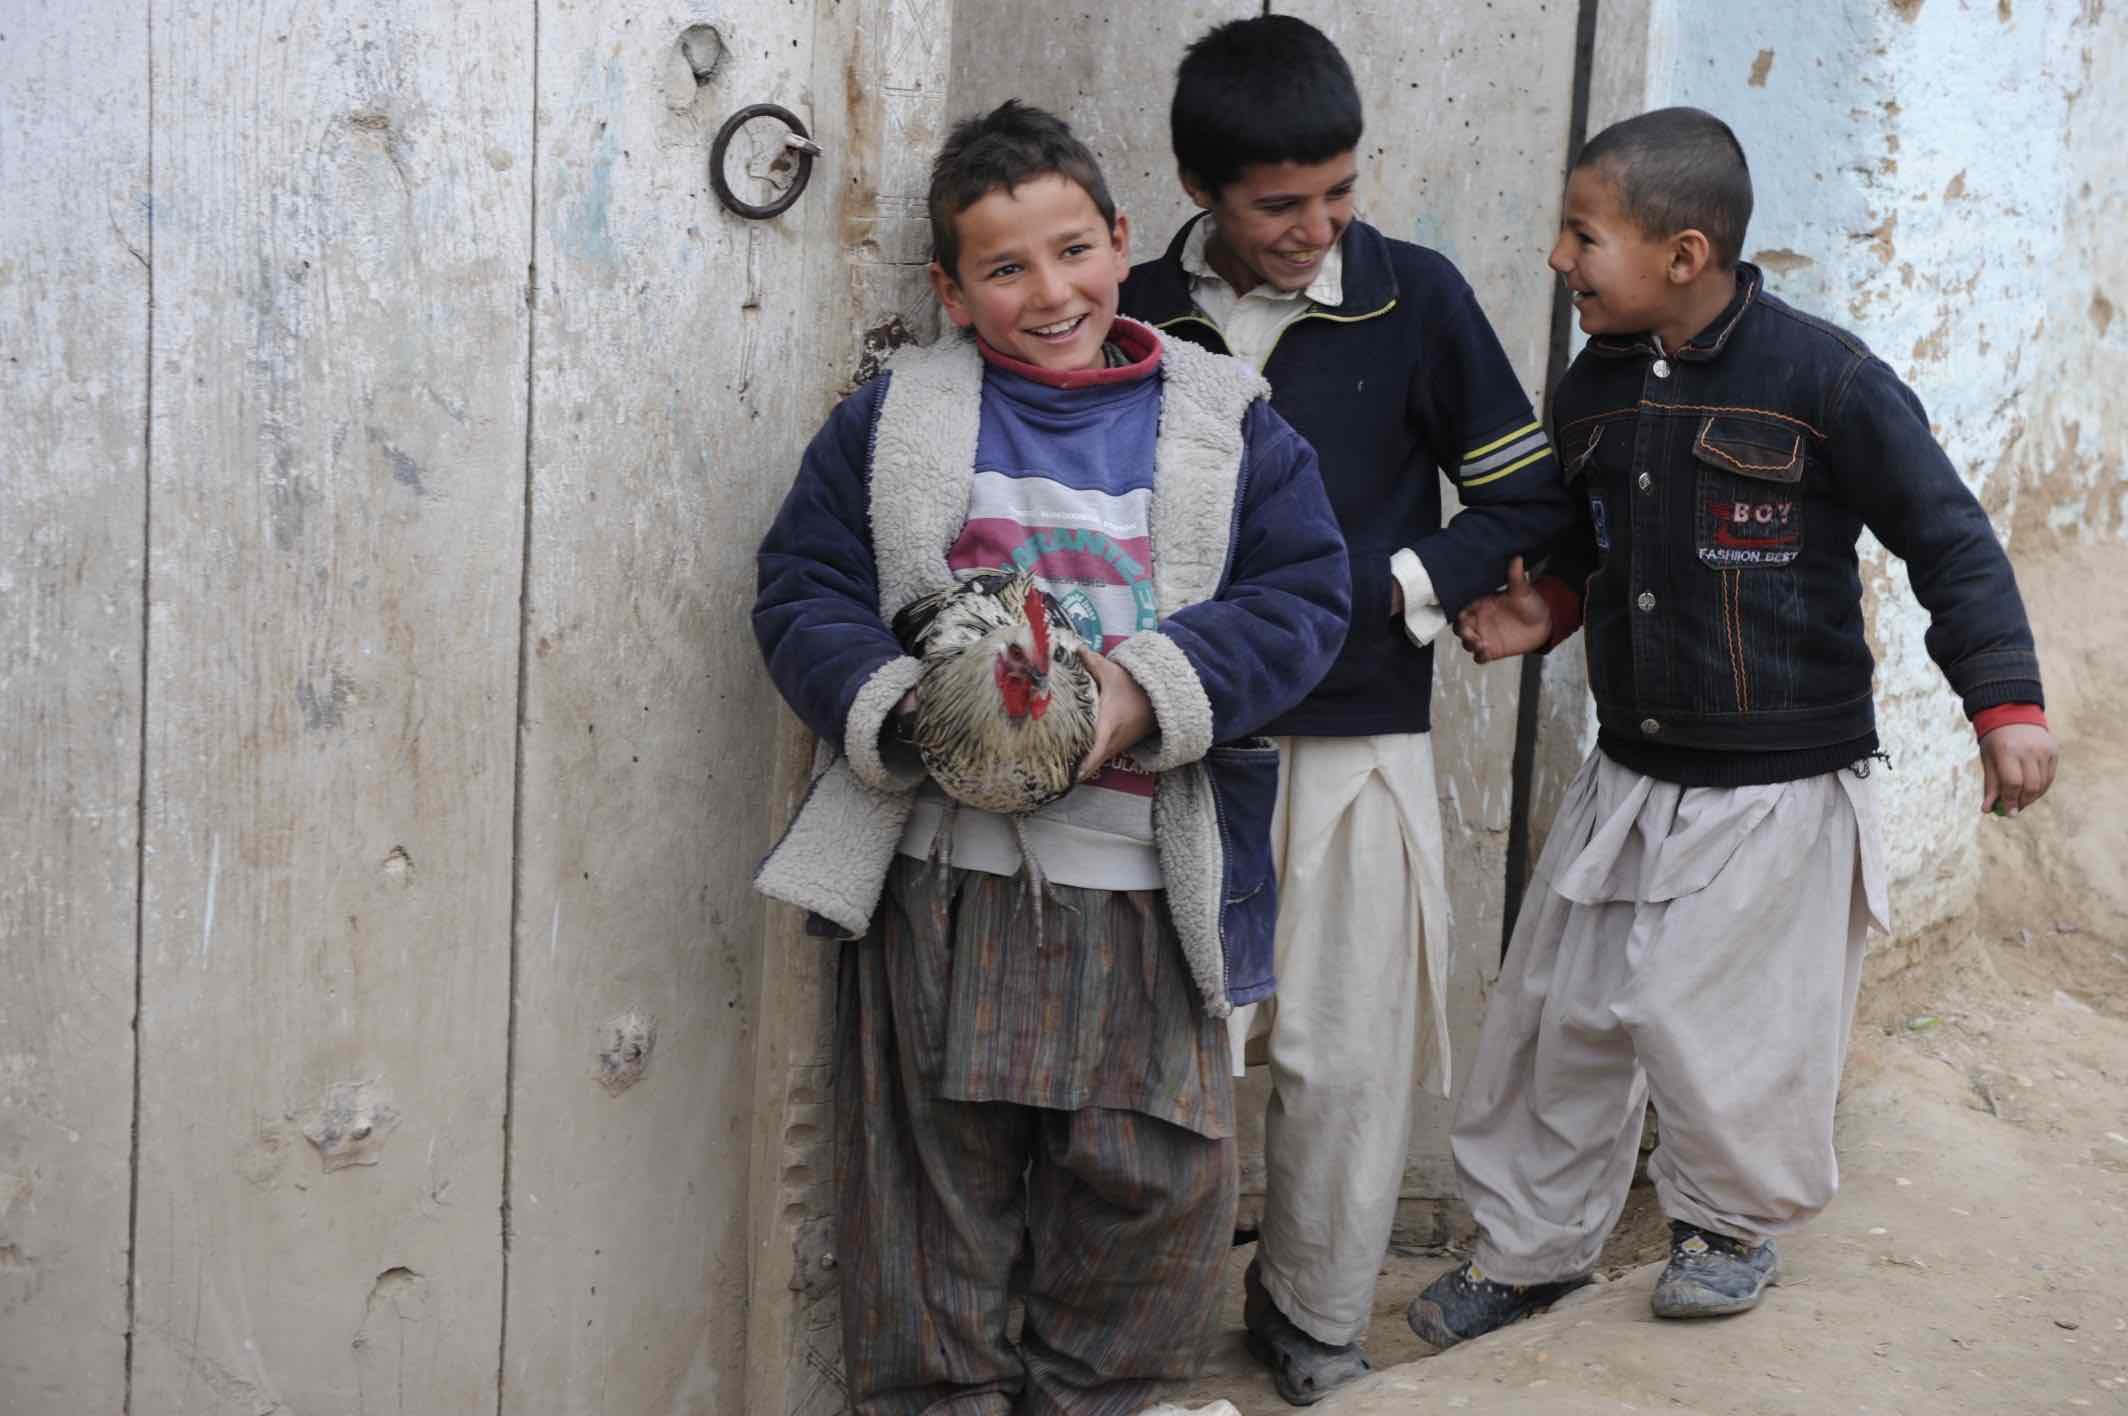 Pojkar i Afghanistan. Foto: Henrik Eskilsson, Försvarsmakten